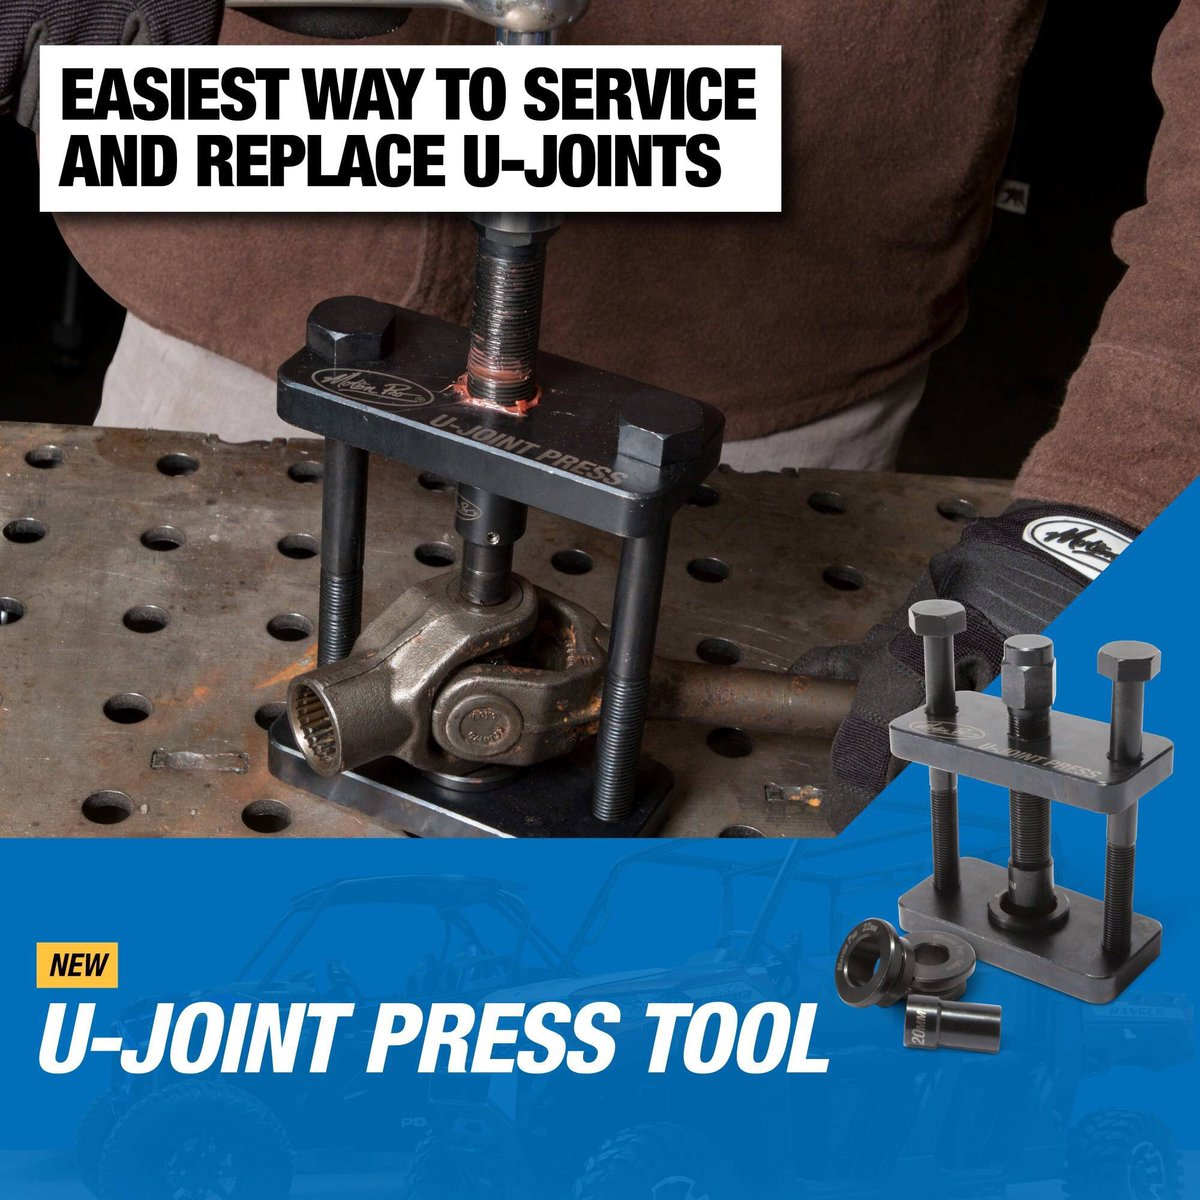 Motion Pro 08-0438 U-Joint Press Tool for ATV UTV